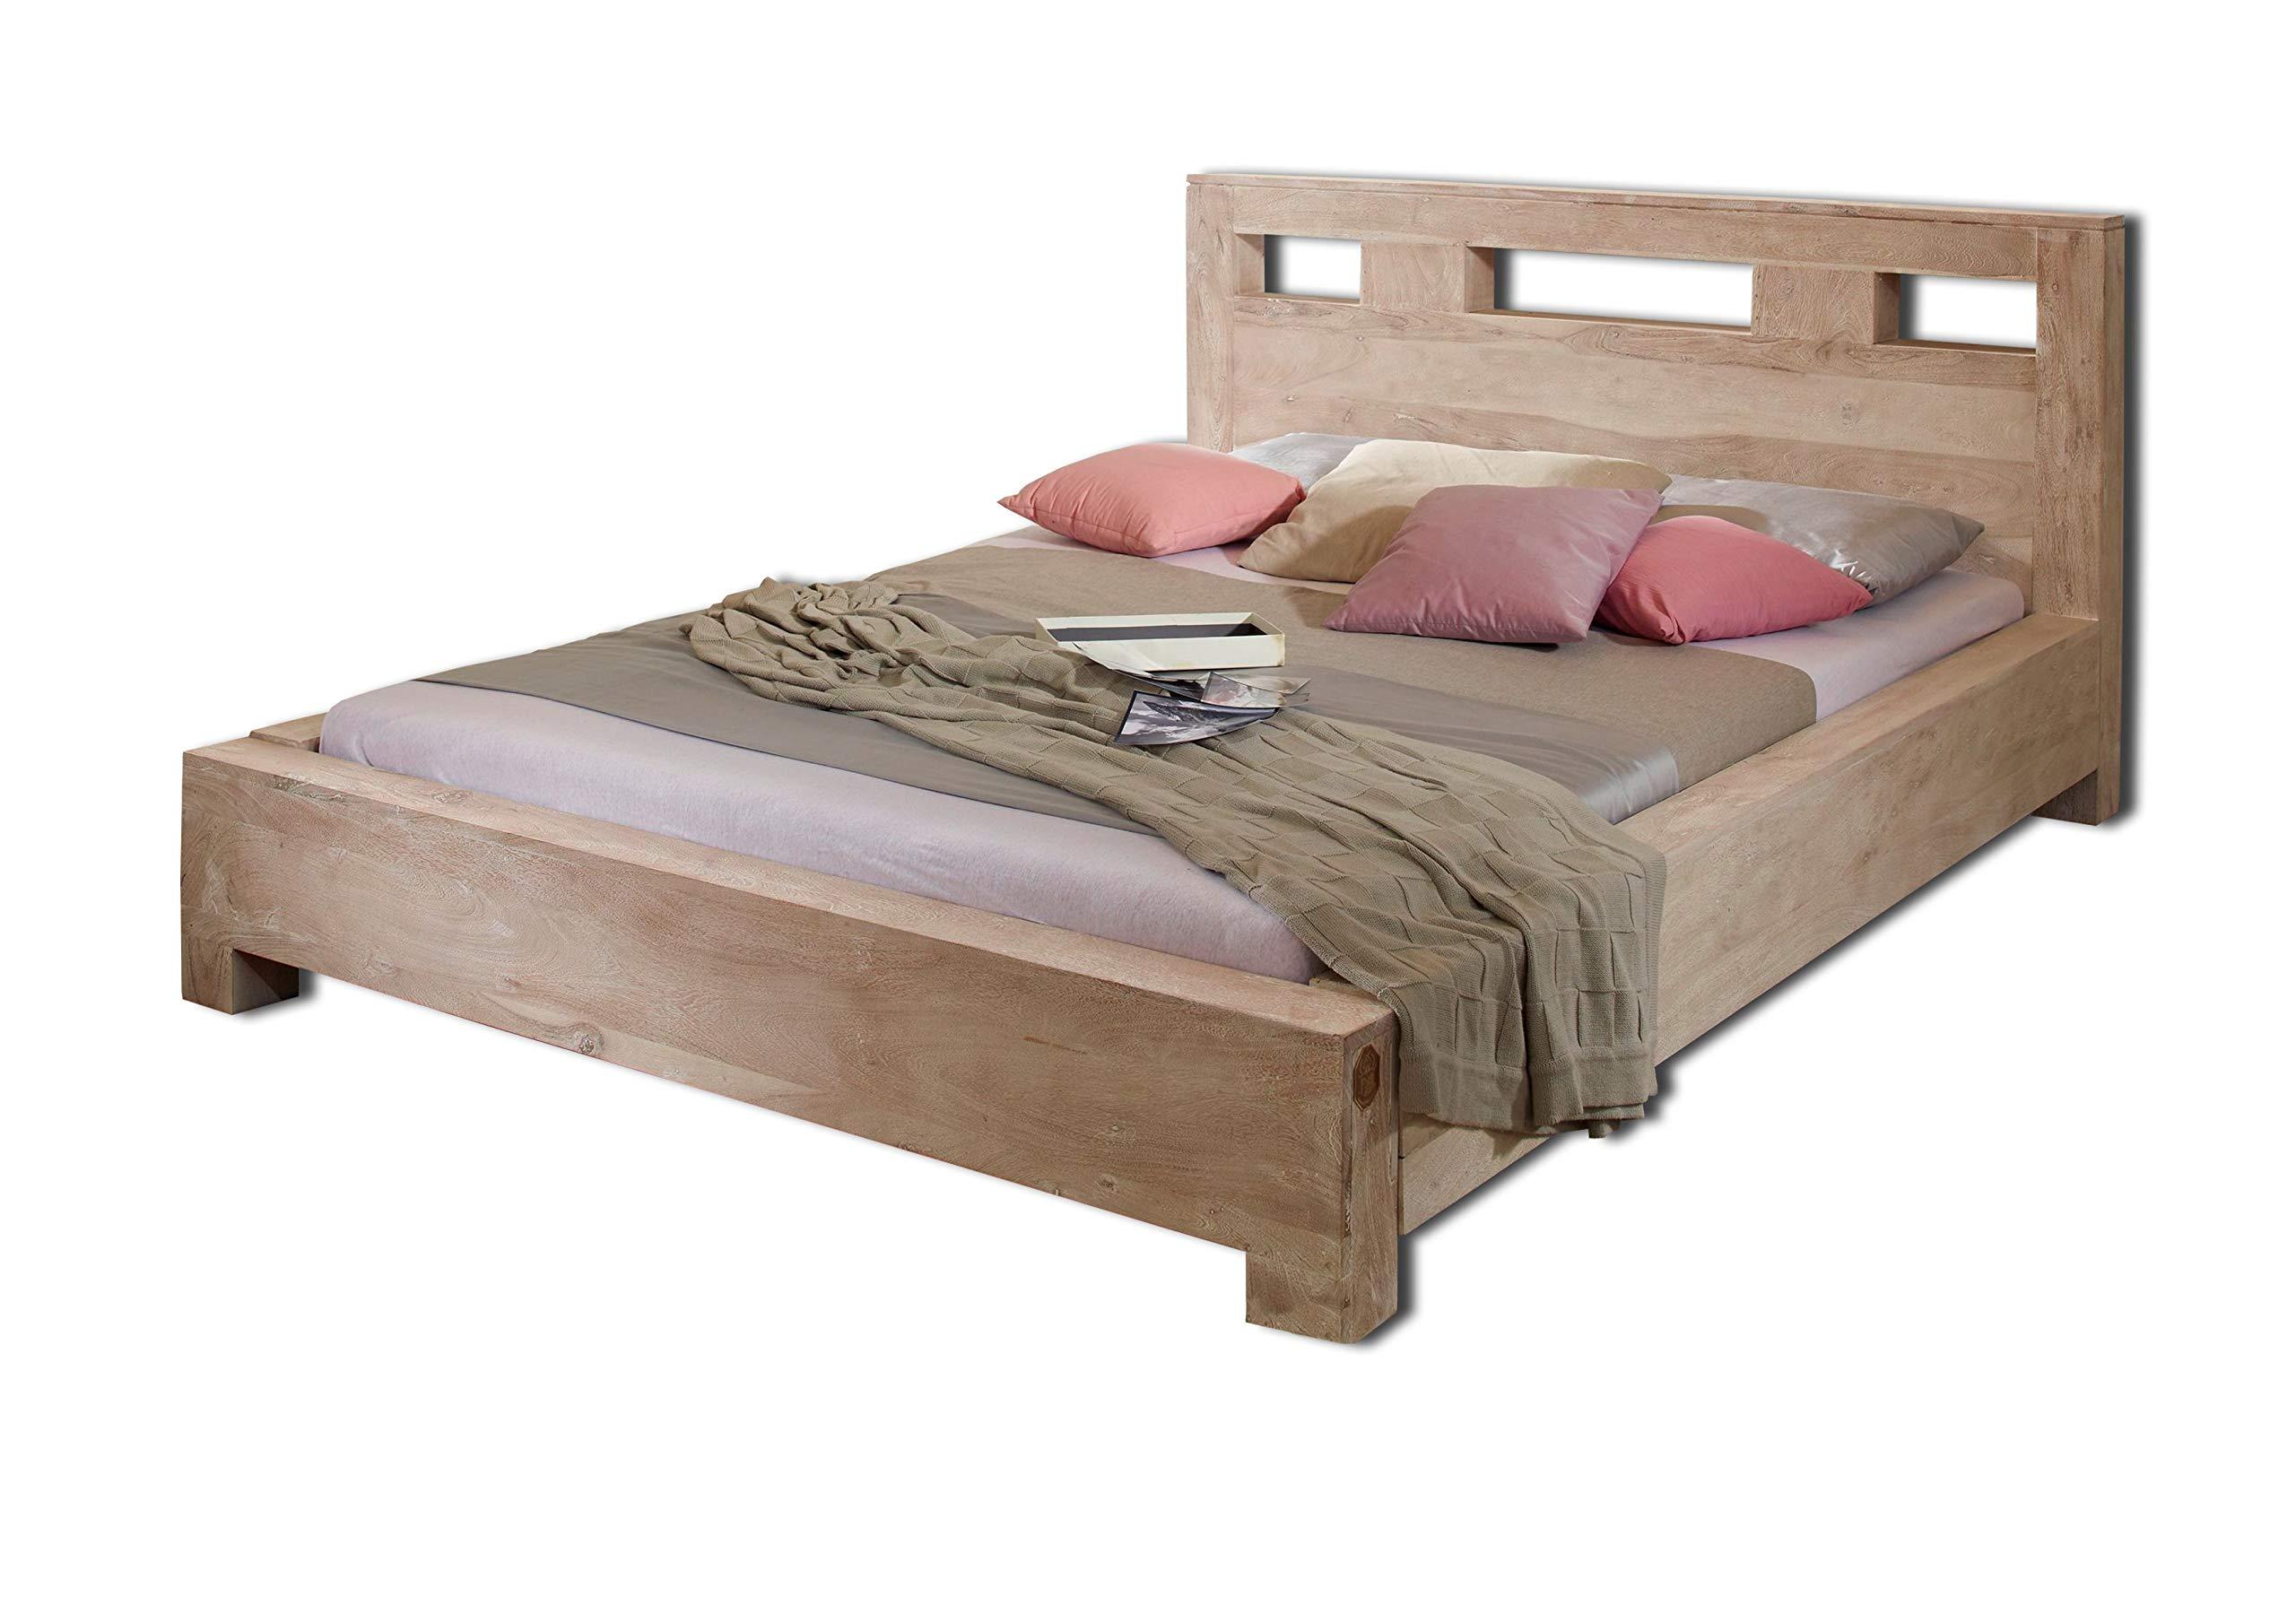 Full Size of Palettenbett Ikea 140x200 Lipa Bett Holz Massivholzbett 90 100 120 140 160 180 Miniküche Betten Bei 160x200 Küche Kaufen Kosten Modulküche Sofa Mit Wohnzimmer Palettenbett Ikea